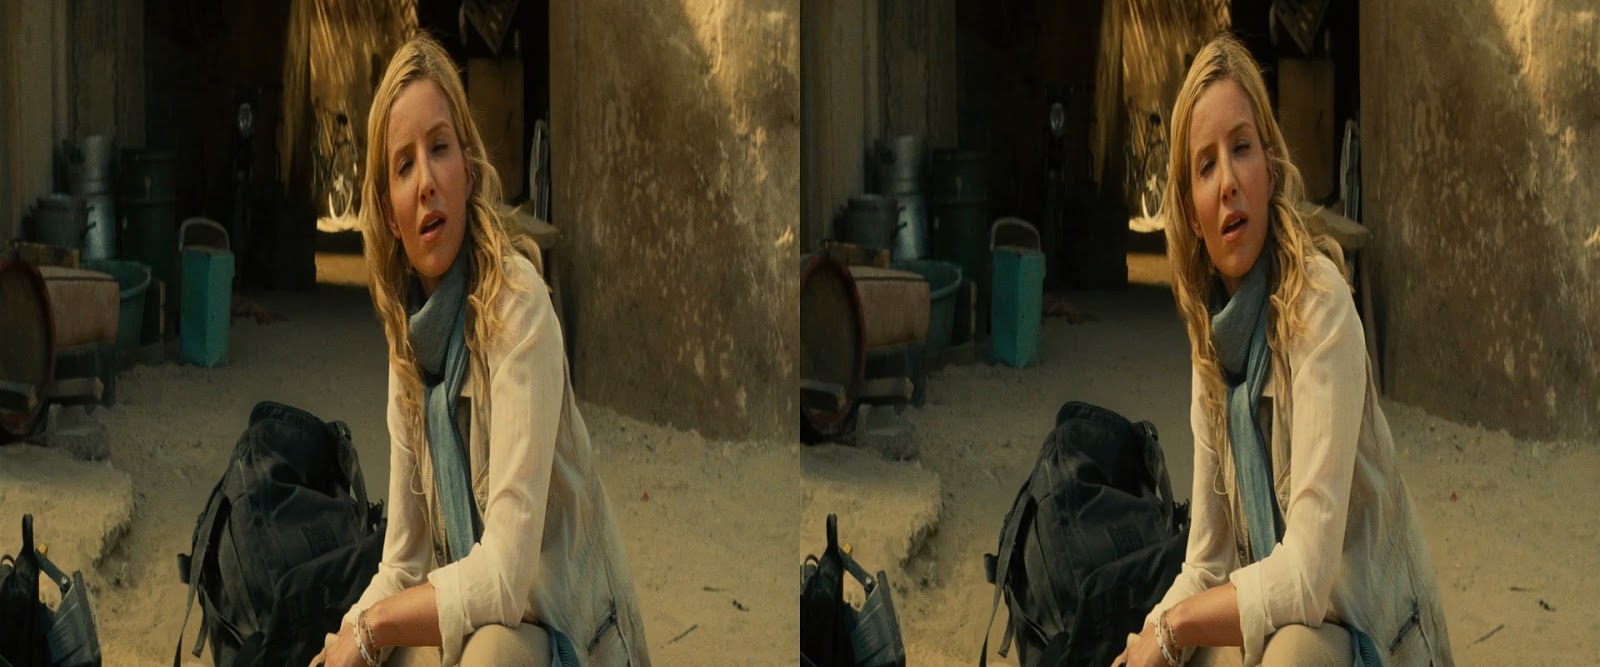 La Momia (2017) 3D SBS 1080p Audio Español Latino - Ingles captura 2